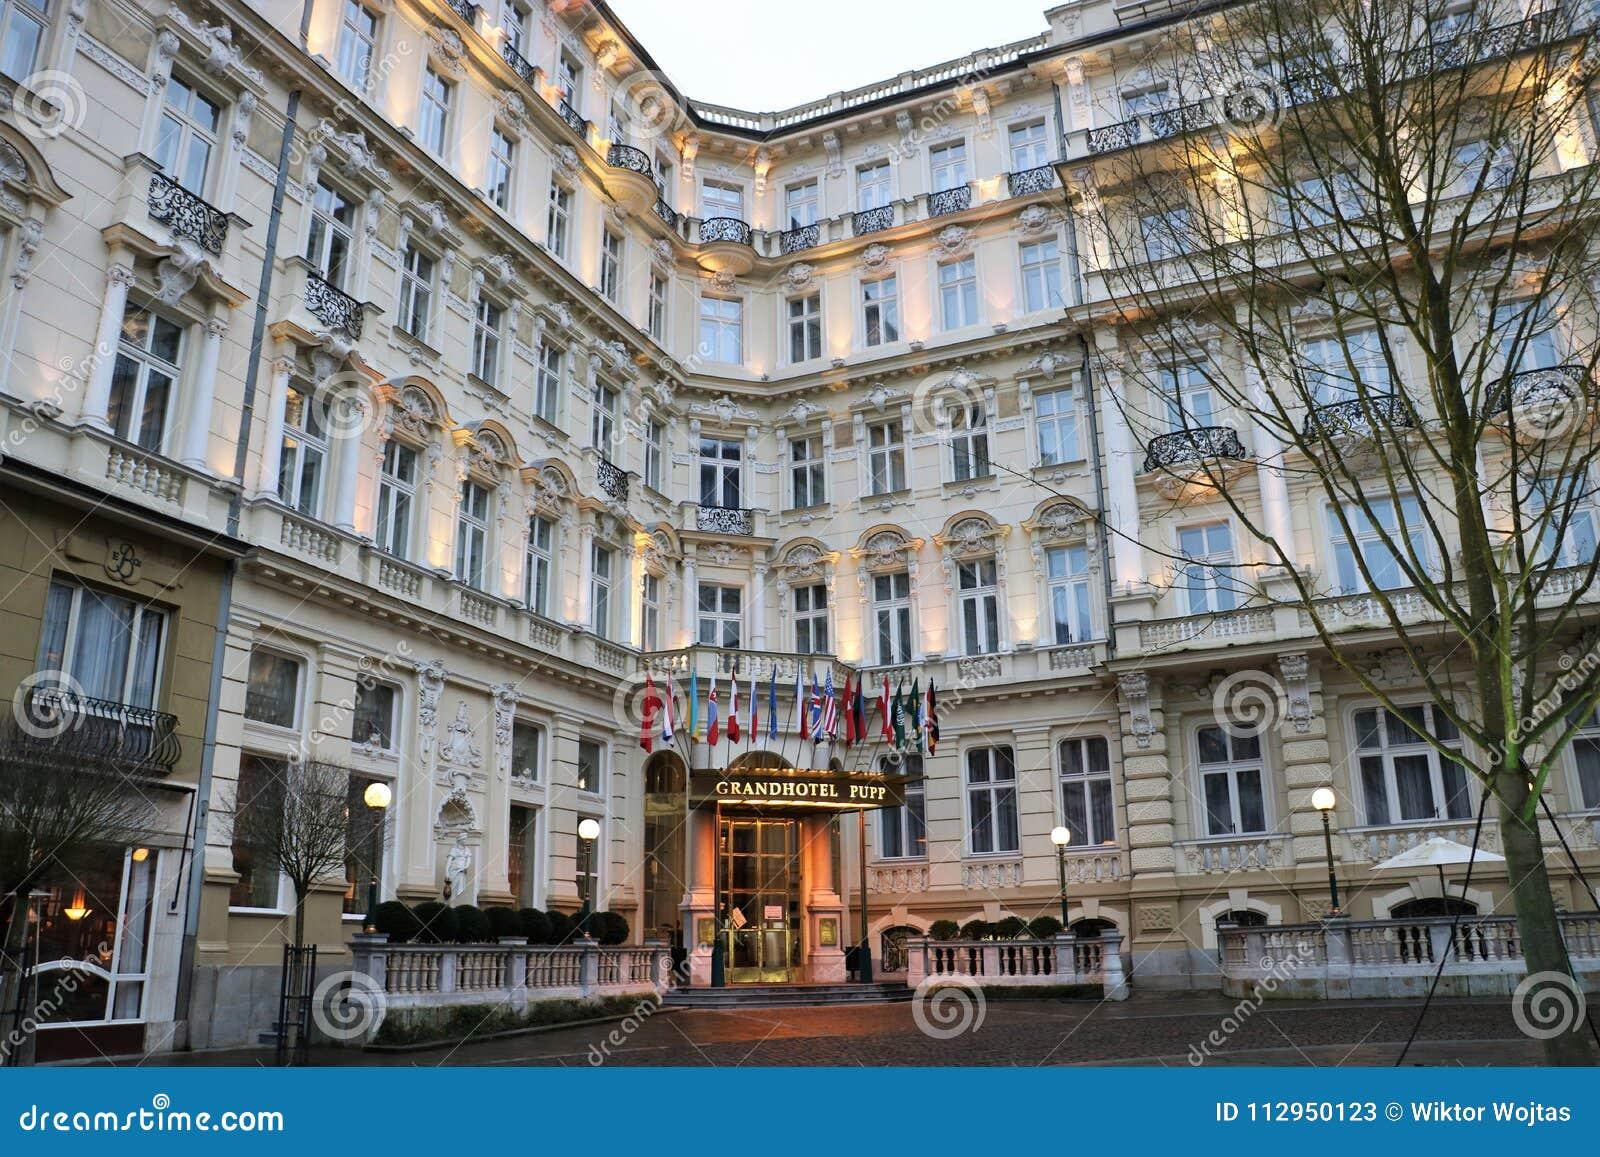 Grandhotel Pupp Karlovy Vary Editorial Stock Photo Image Of Luxury Festival 112950123